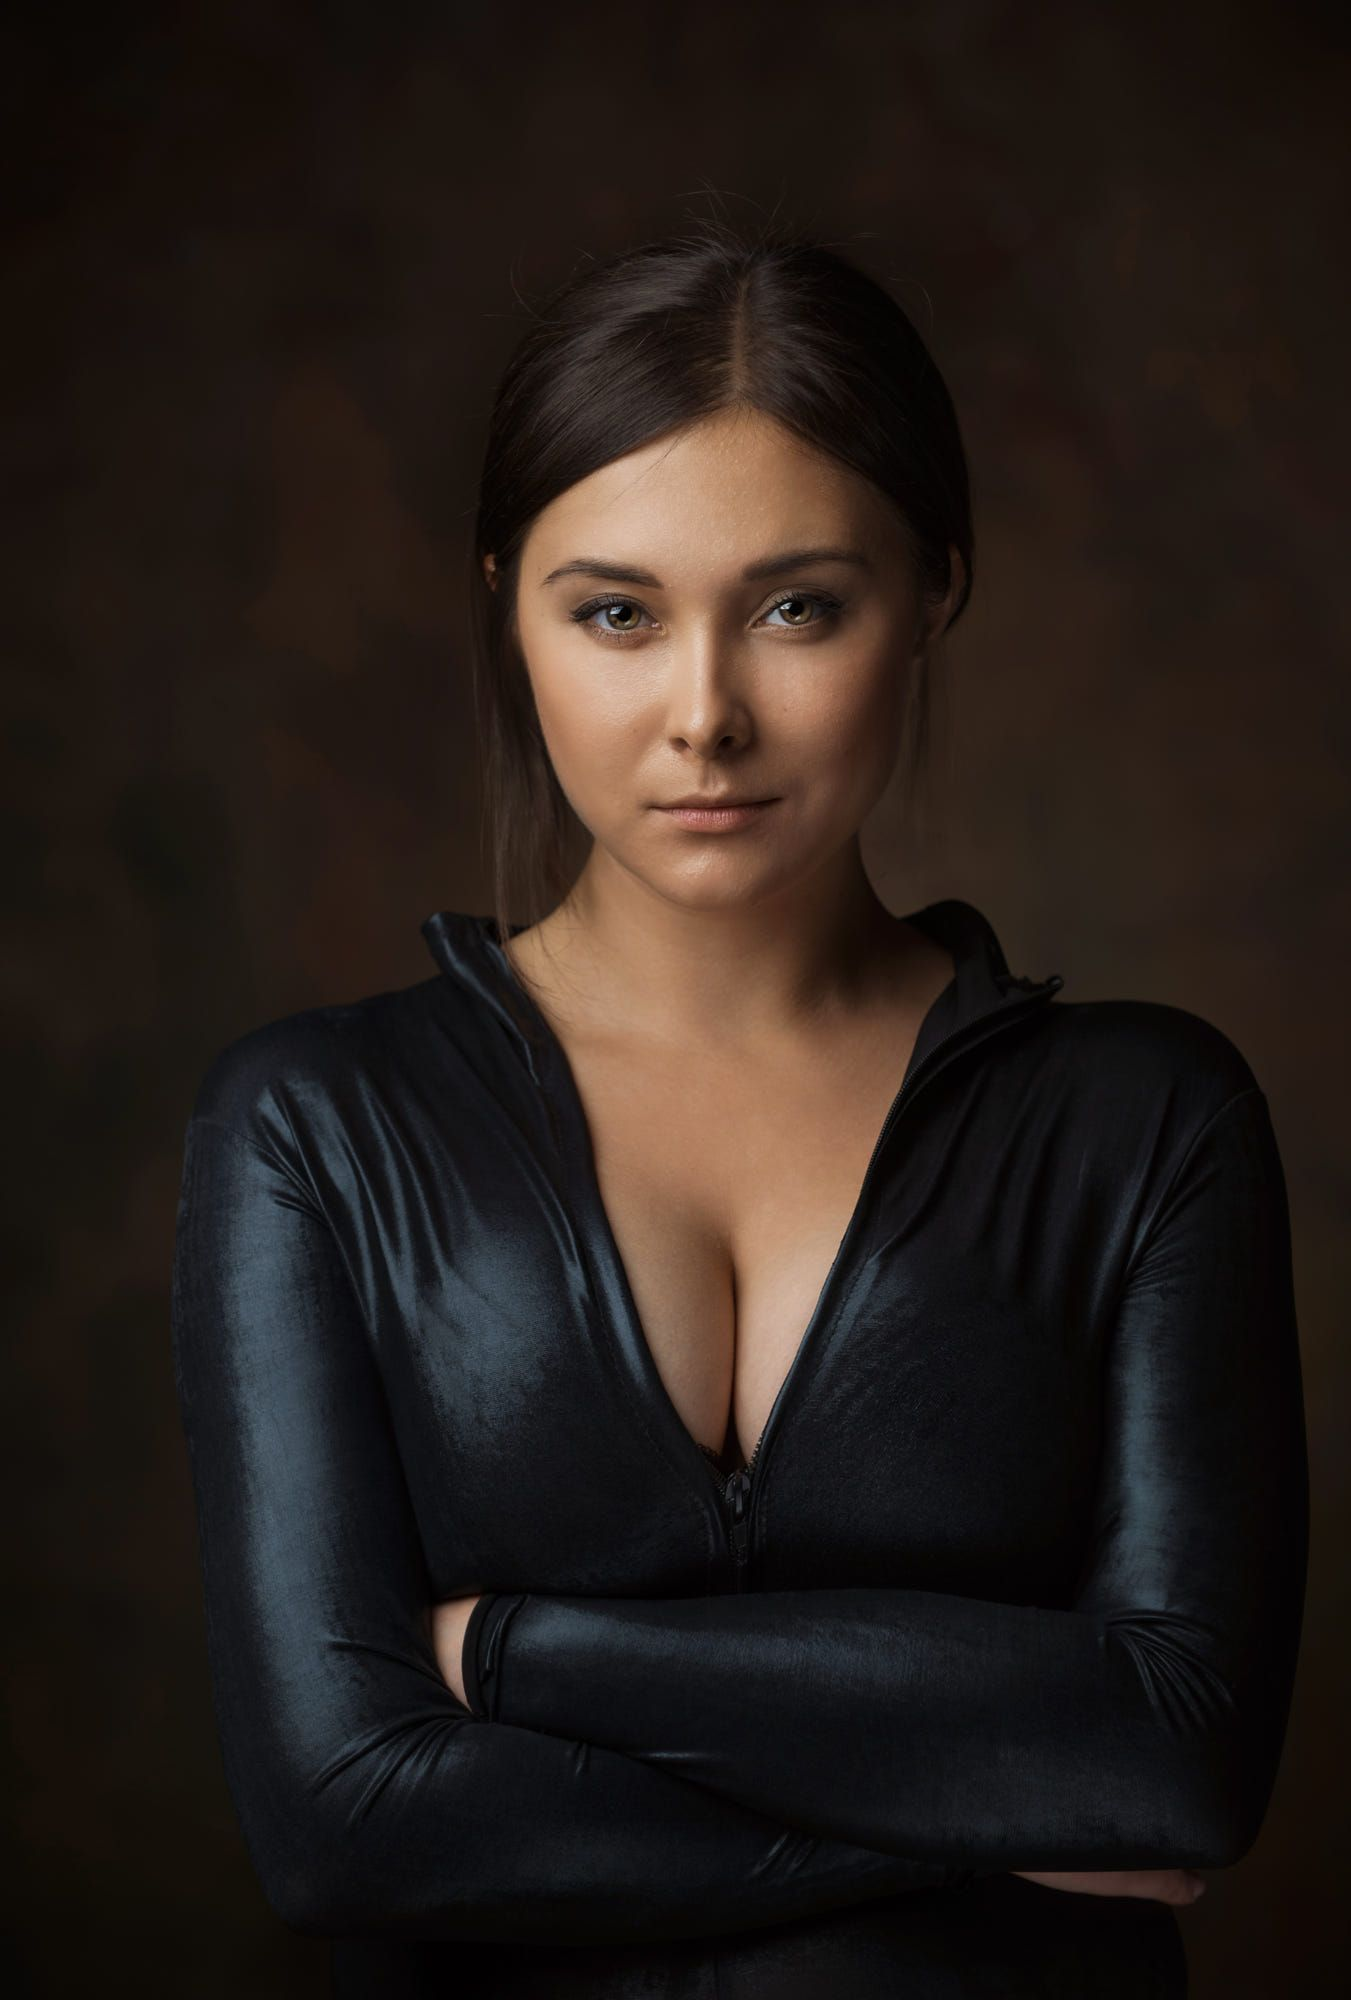 Portrait   model: Nastya Zorina photo by: Maxim Maximov FB